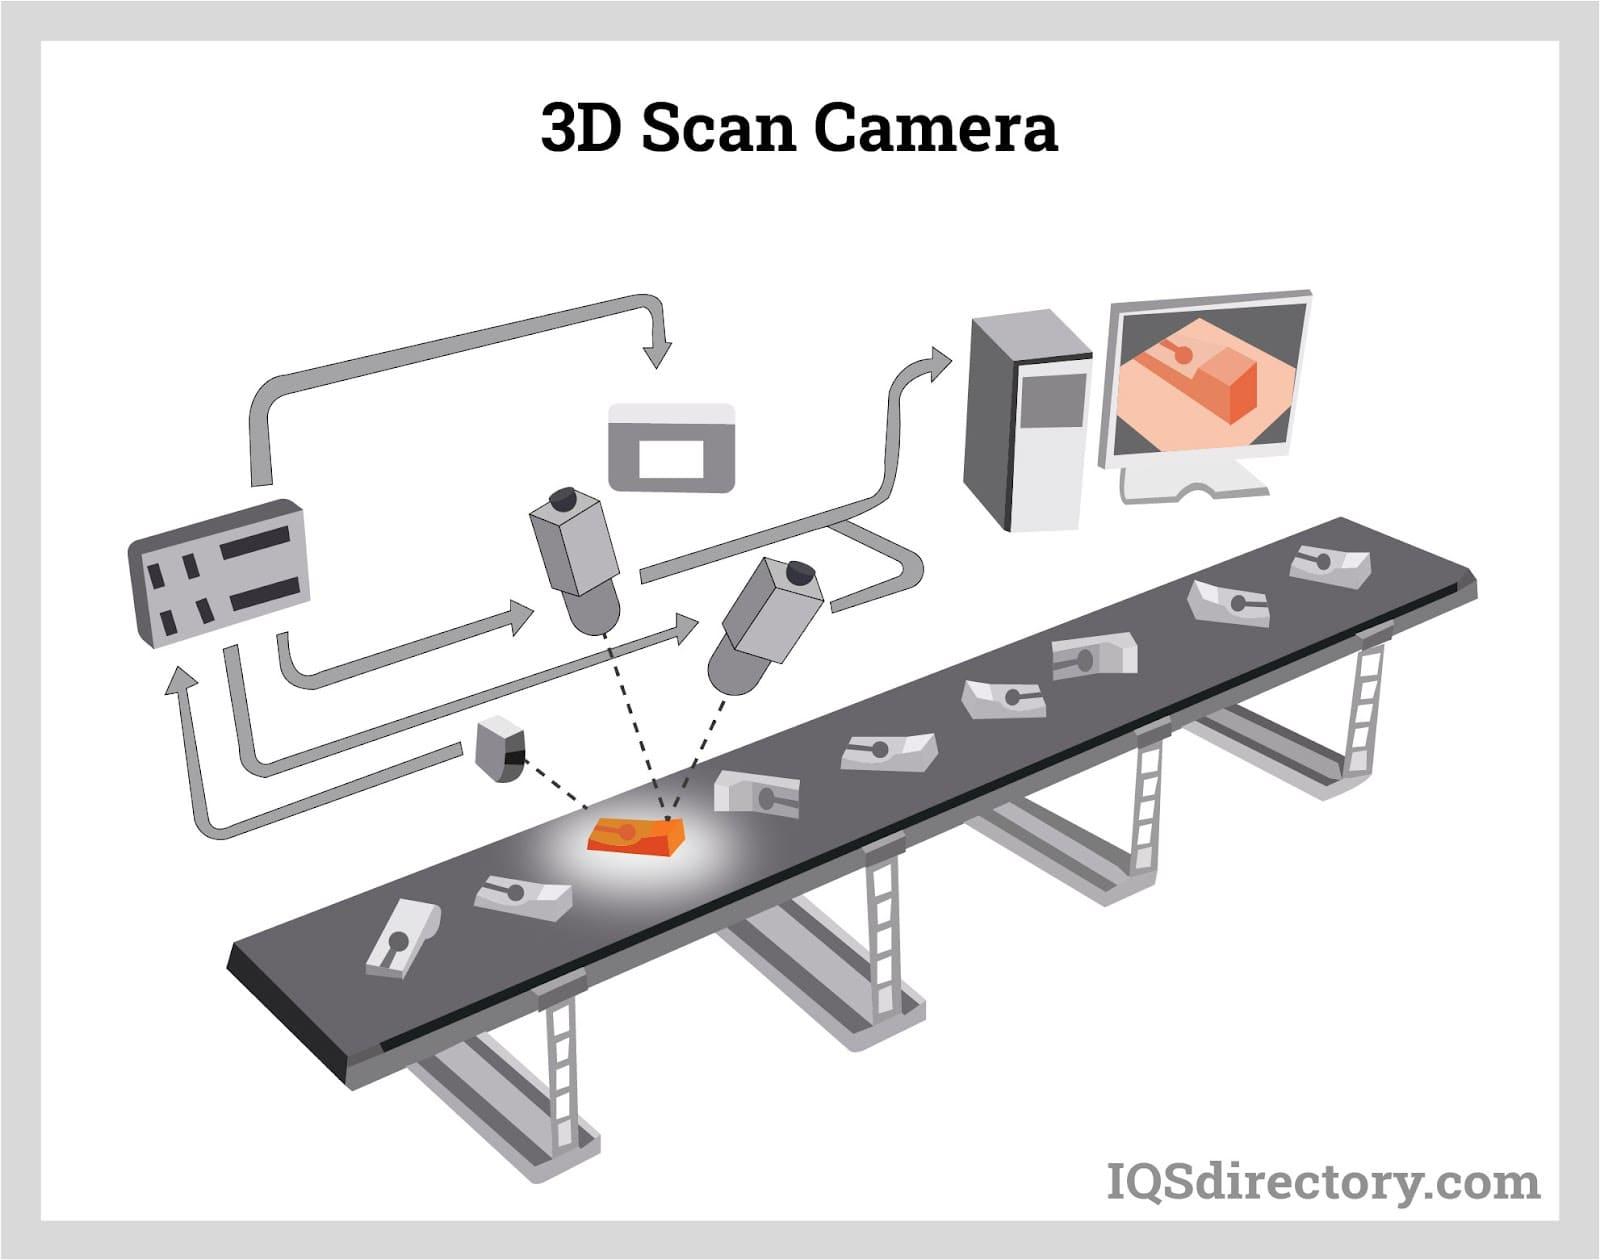 3D Scan Camera